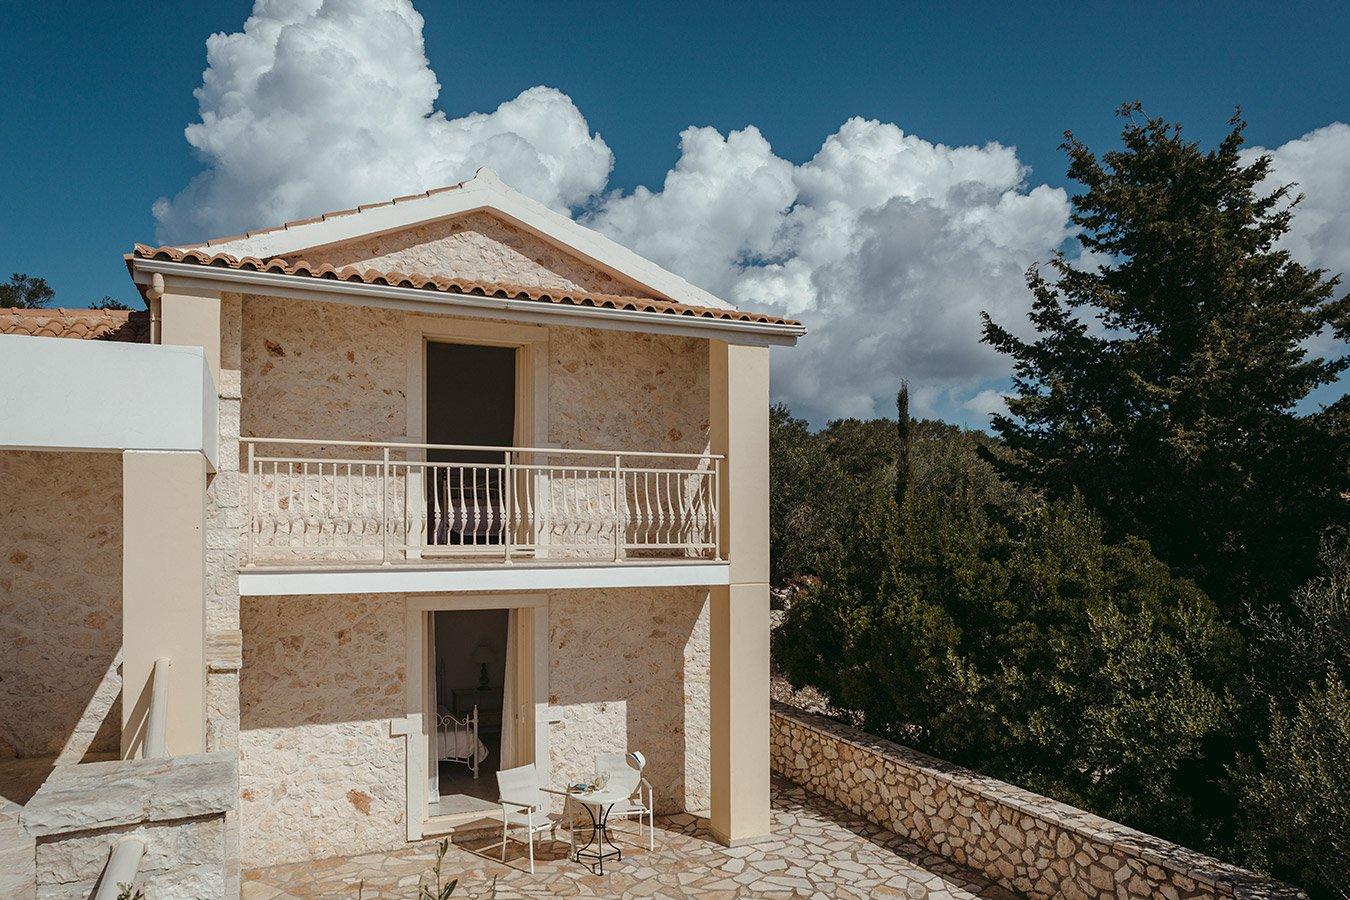 Kyparissi Villa Paxos Exterior Details